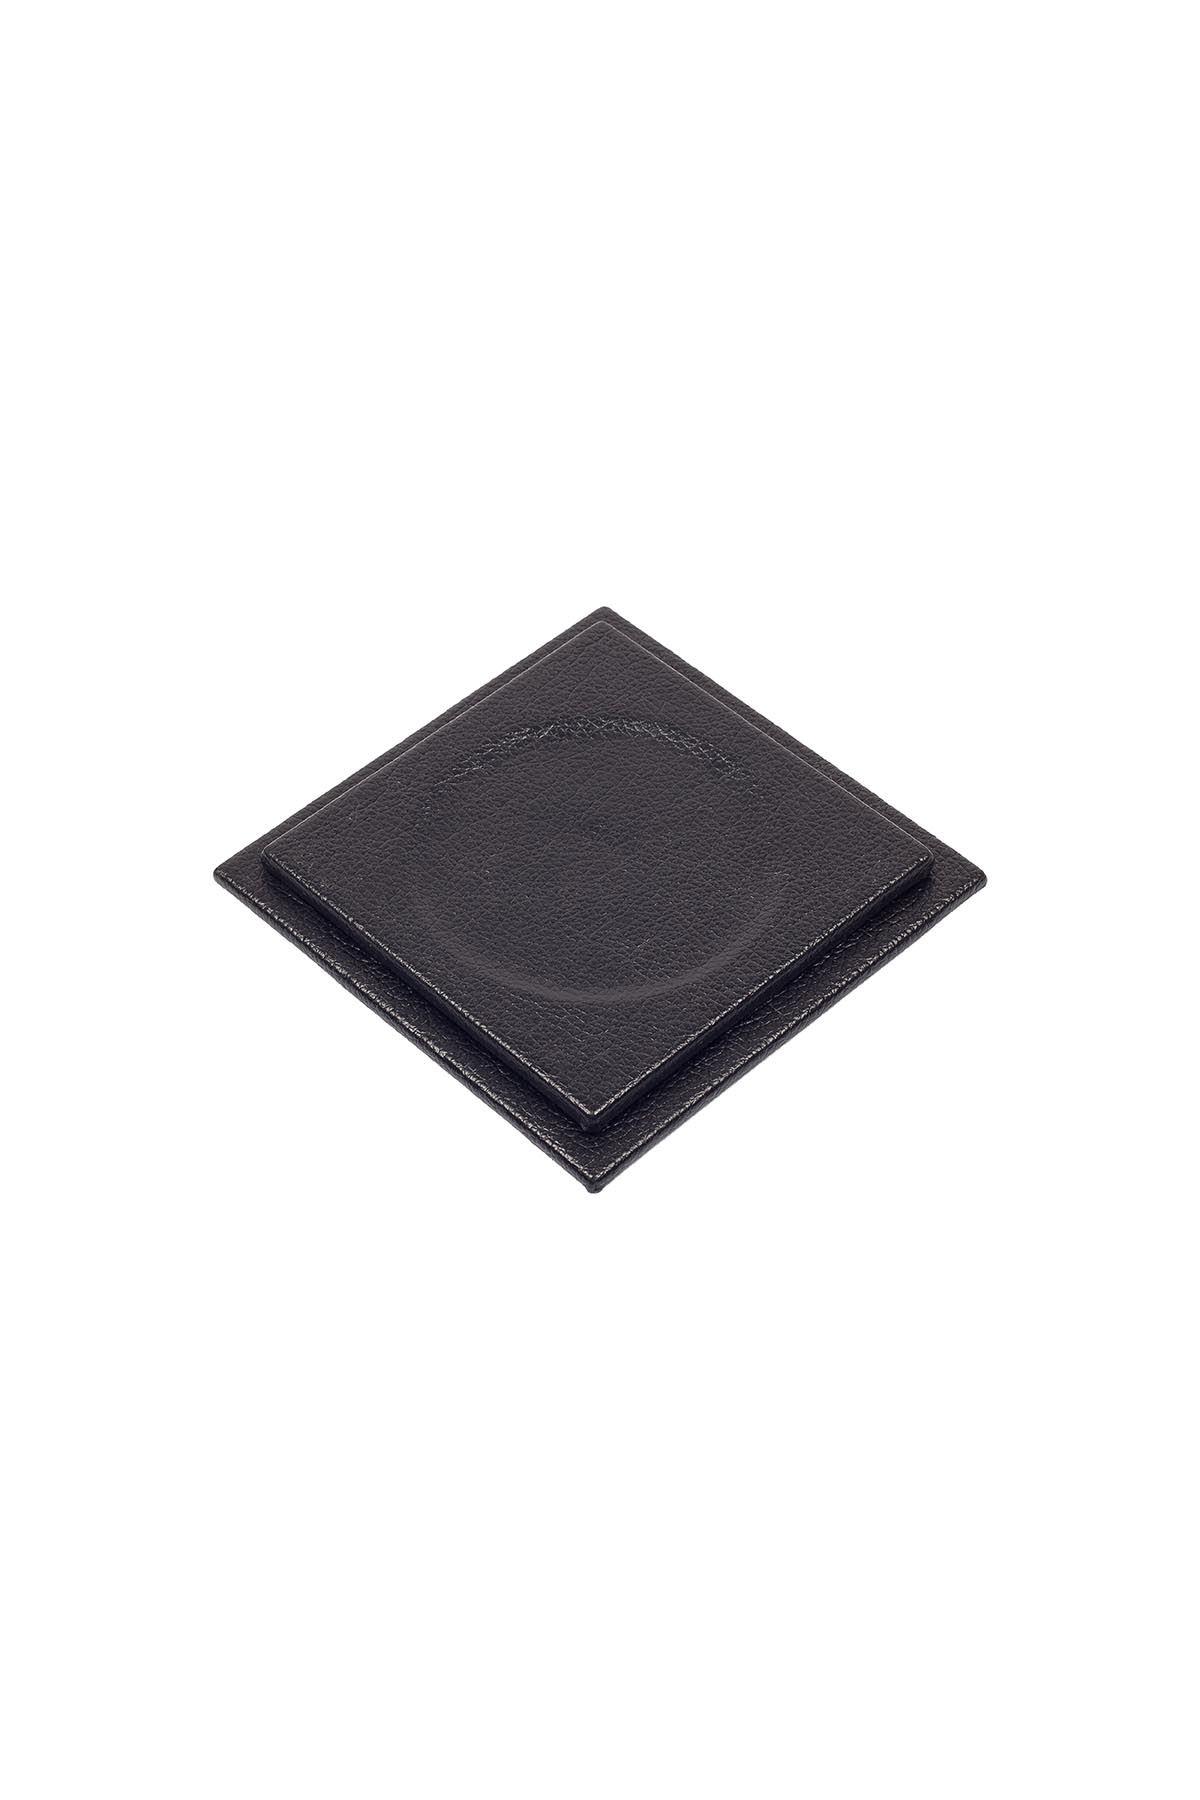 Leather Desk Set 4 Accessories Black